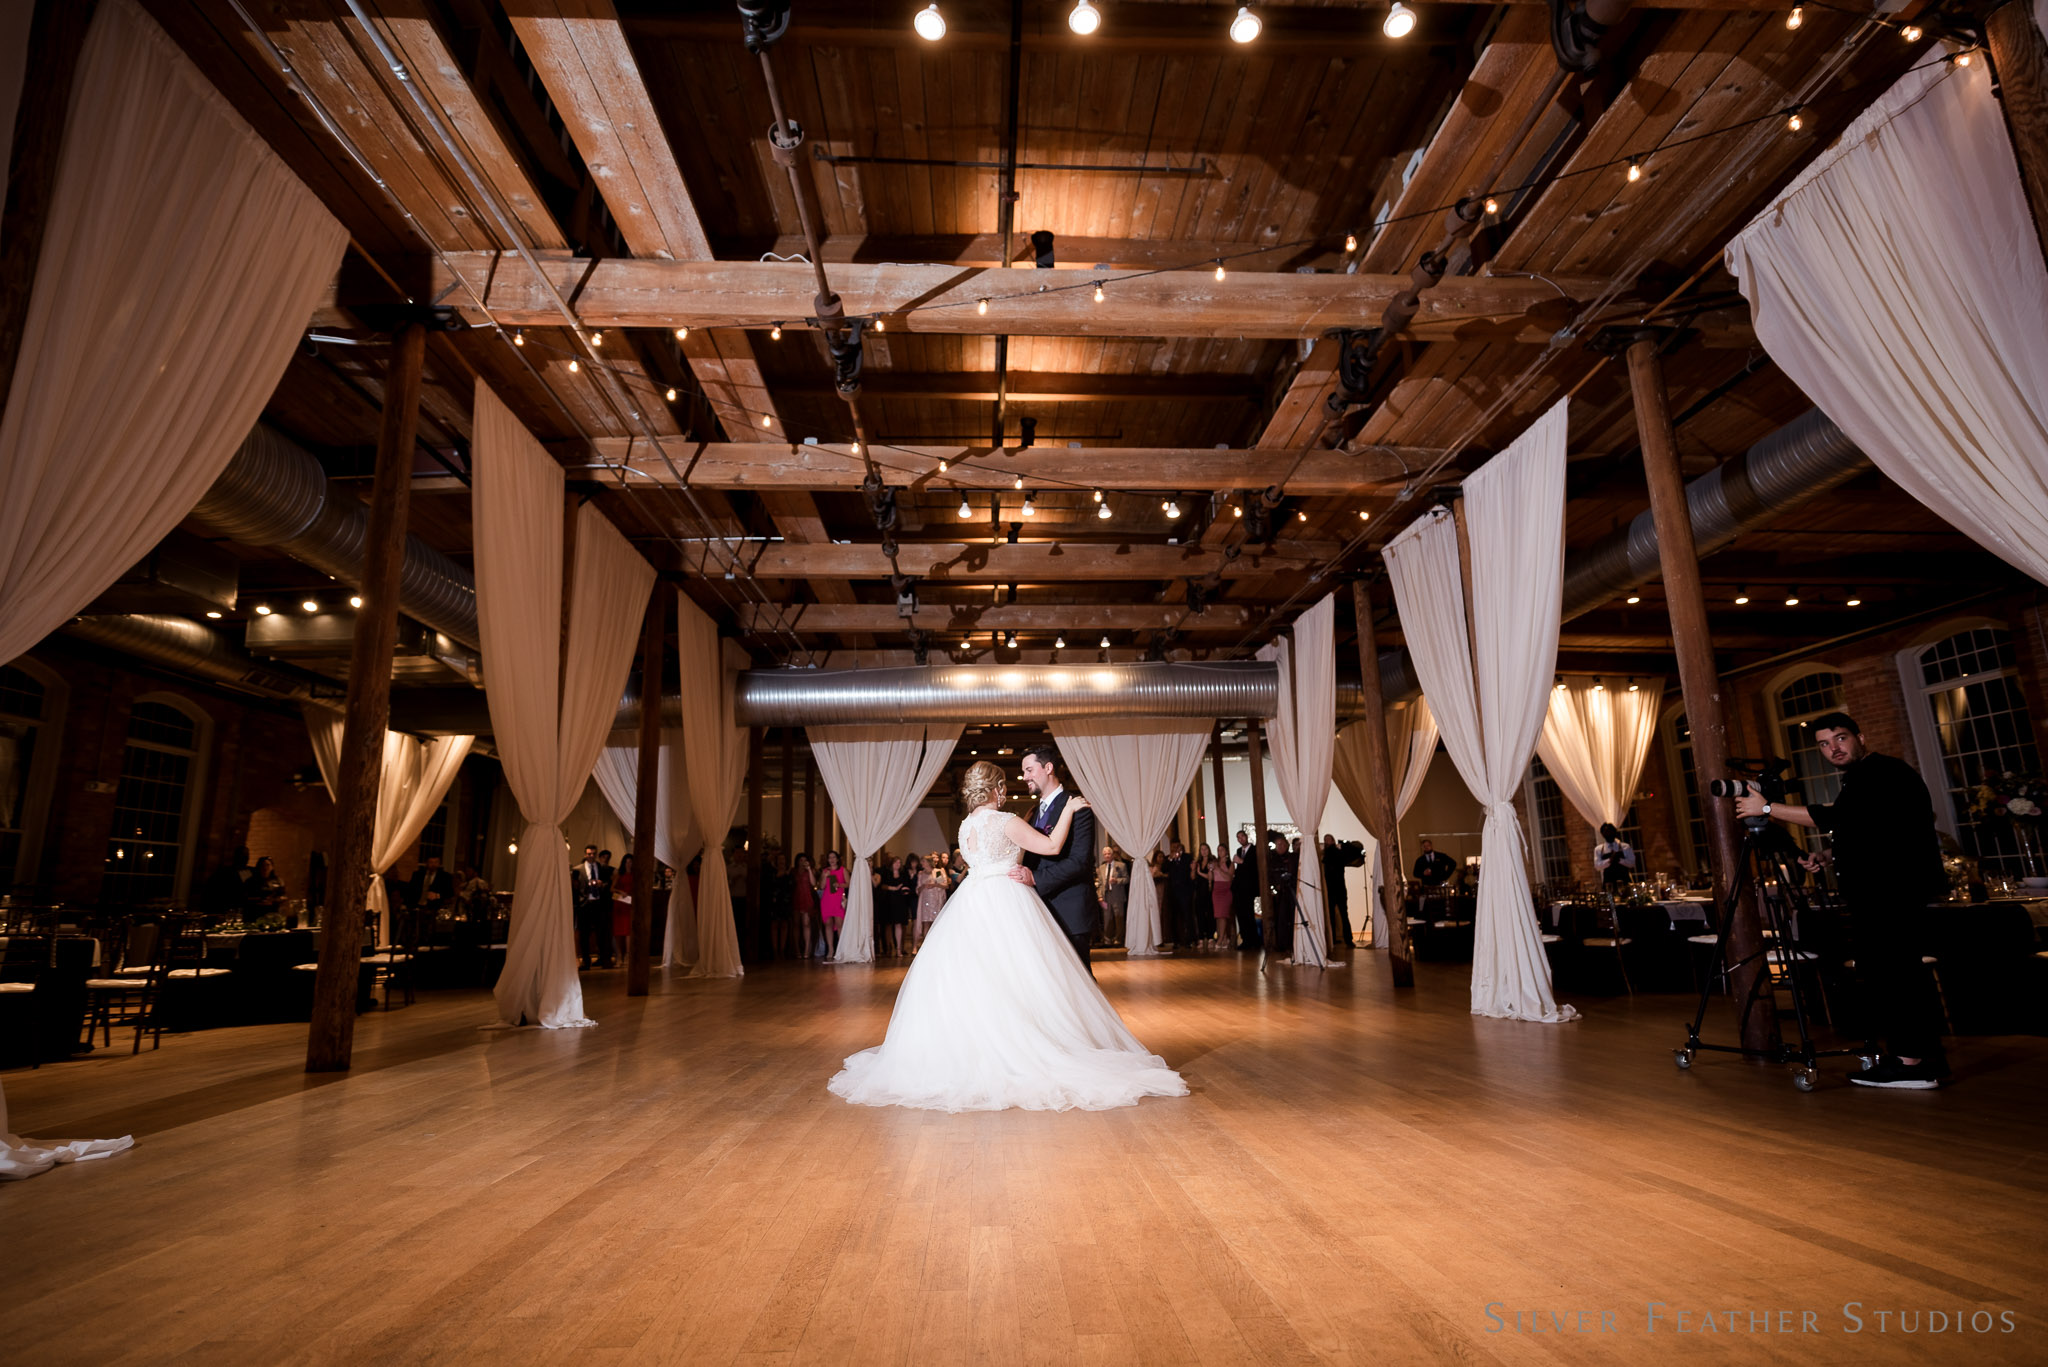 cottom-room-wedding-photography-040.jpg